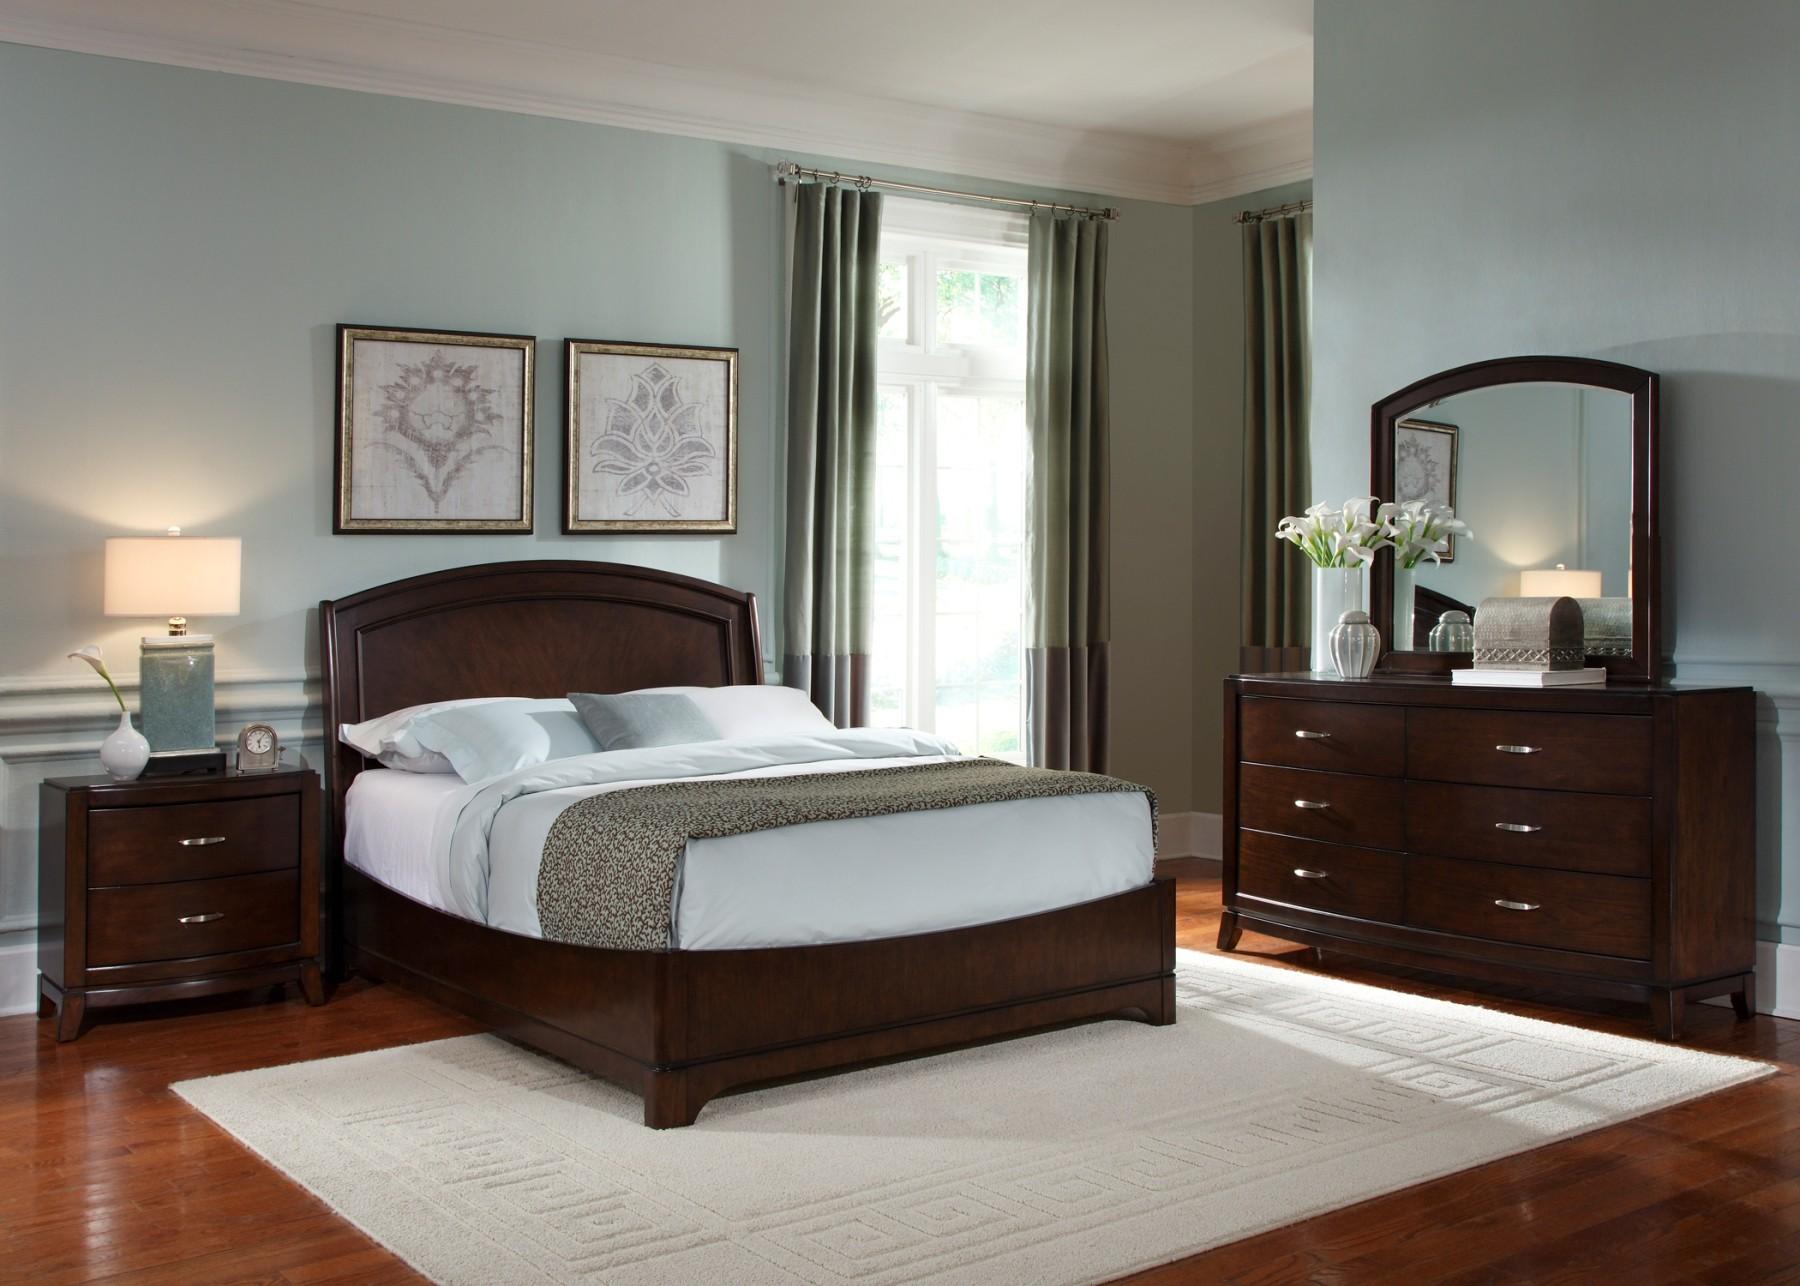 avalon platform bedroom set from liberty 505 br qpl coleman furniture